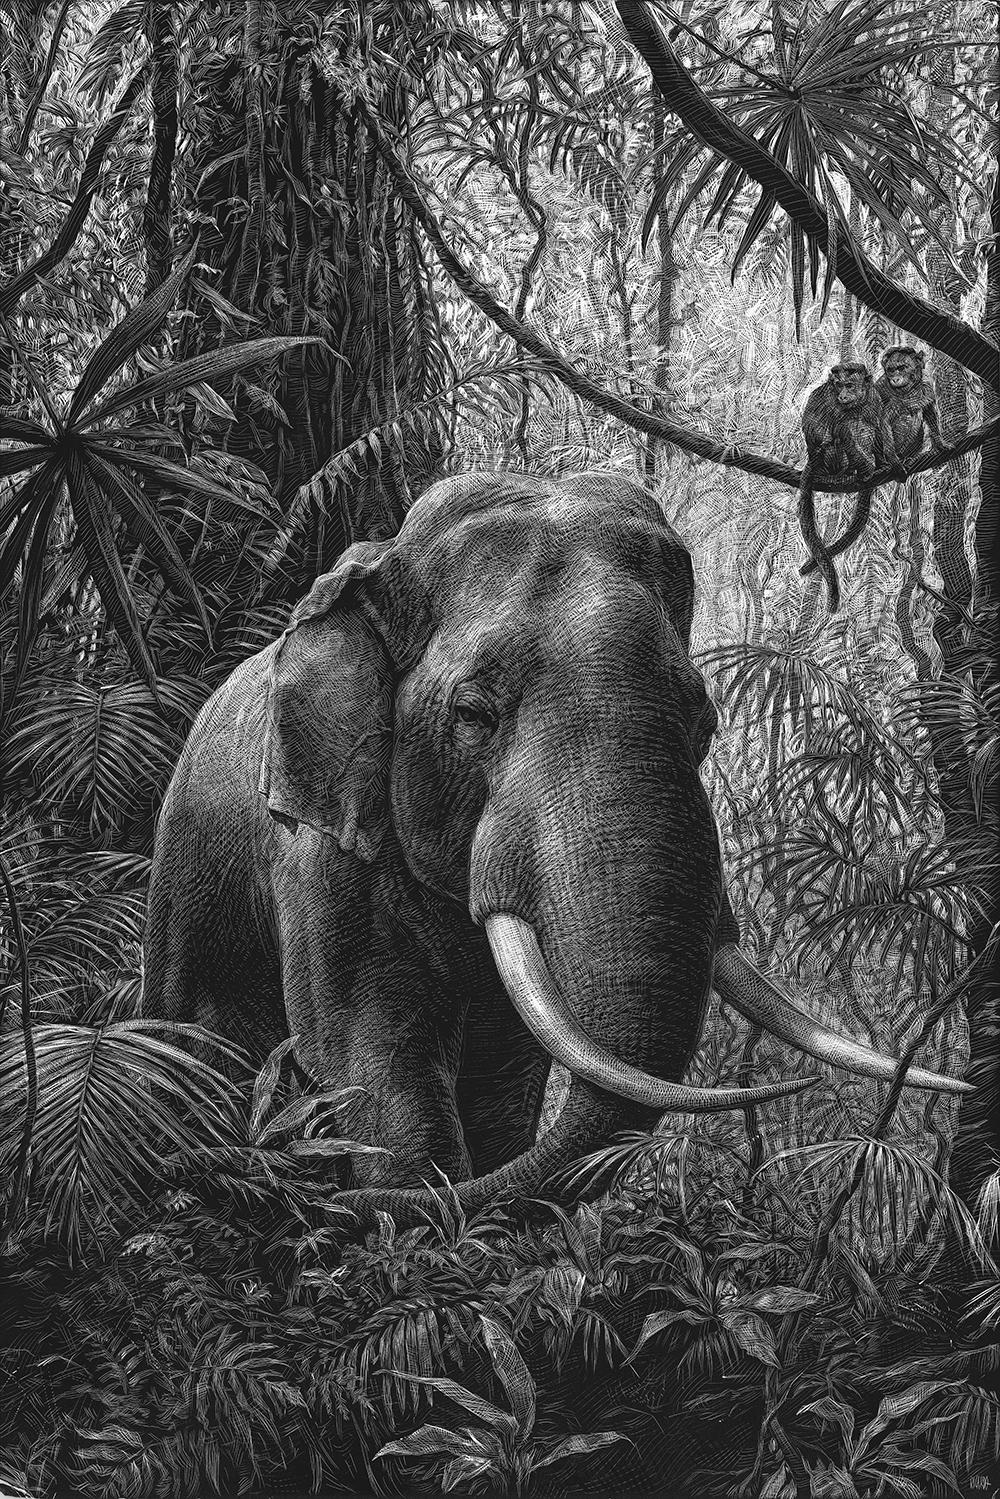 10-Elephant-and-Monkeys-Ricardo-Martinez-Wild-Animals-inside-Scratchboard-Drawings-www-designstack-co